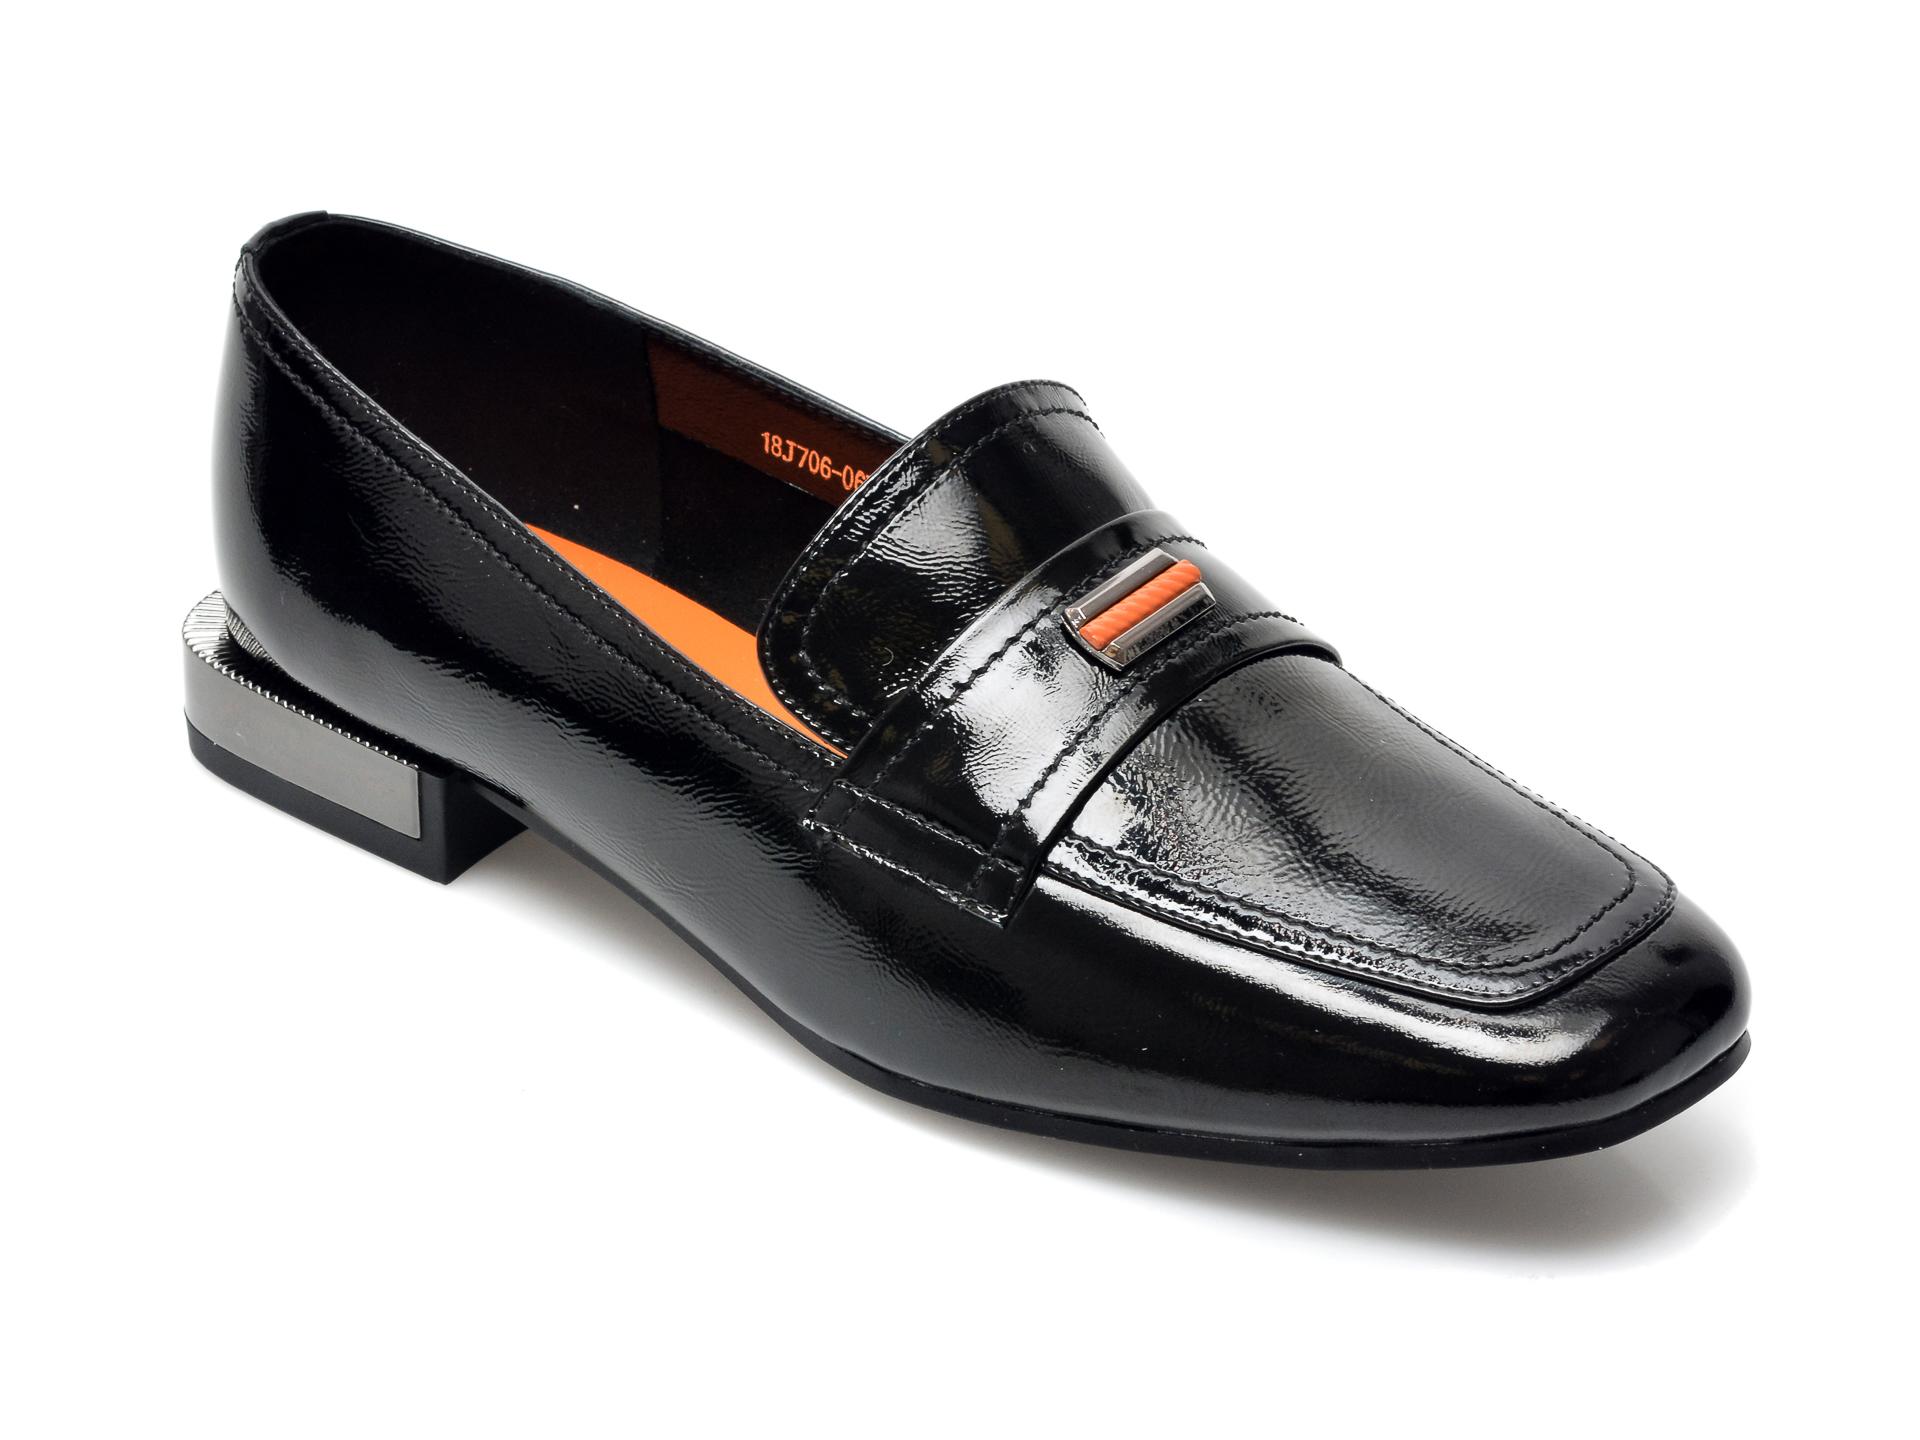 Pantofi FLAVIA PASSINI negri, 18J7060, din piele naturala lacuita